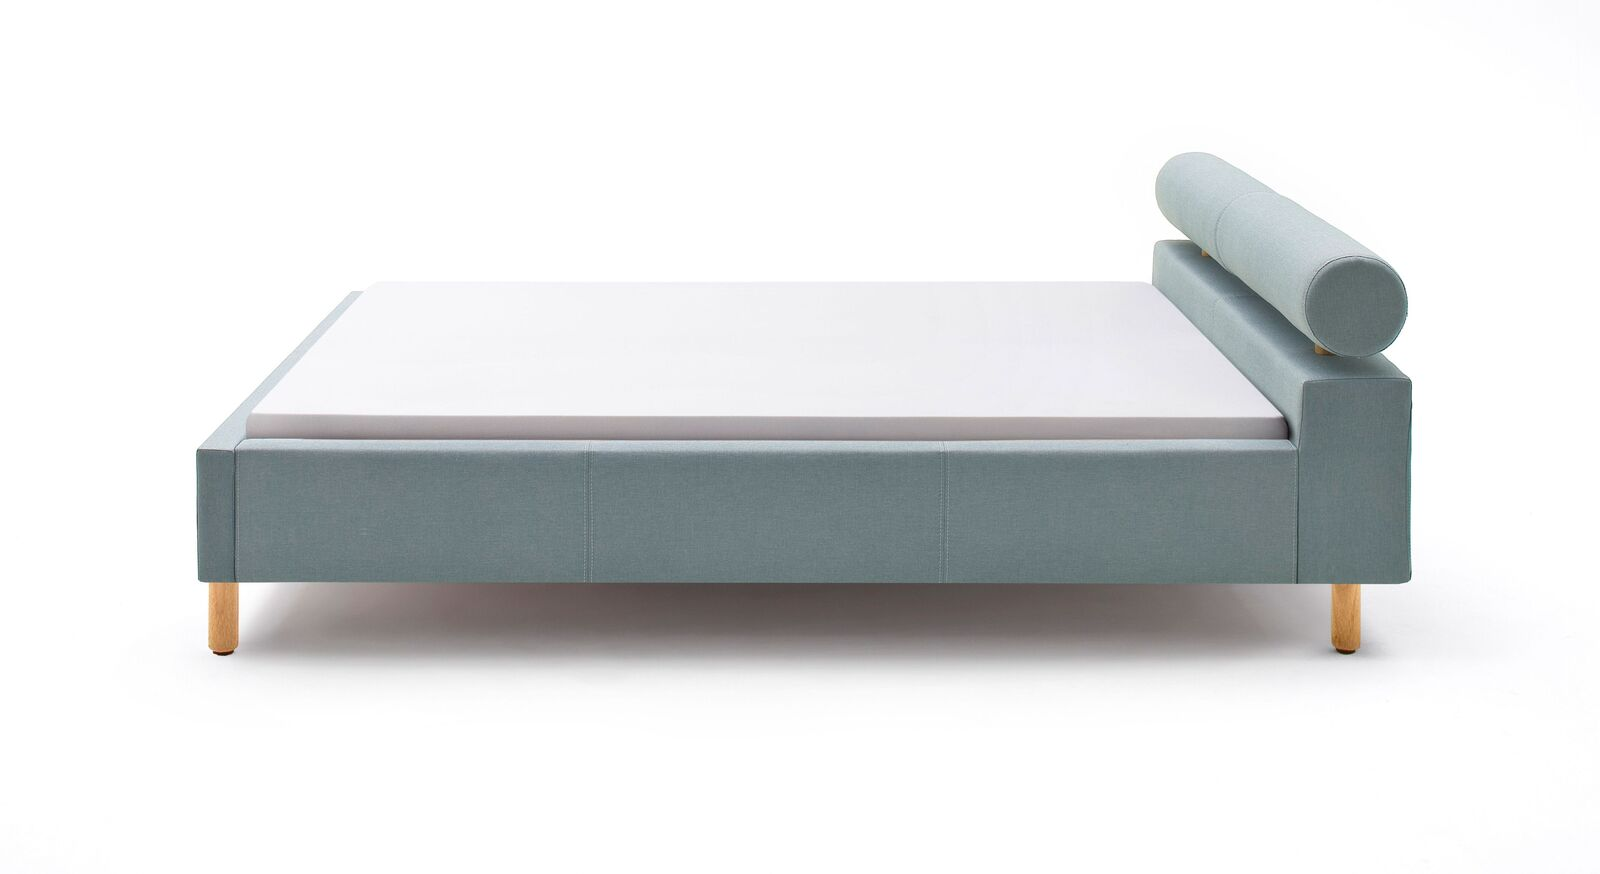 Geradliniges Bett Arlet mit robustem Stoffbezug